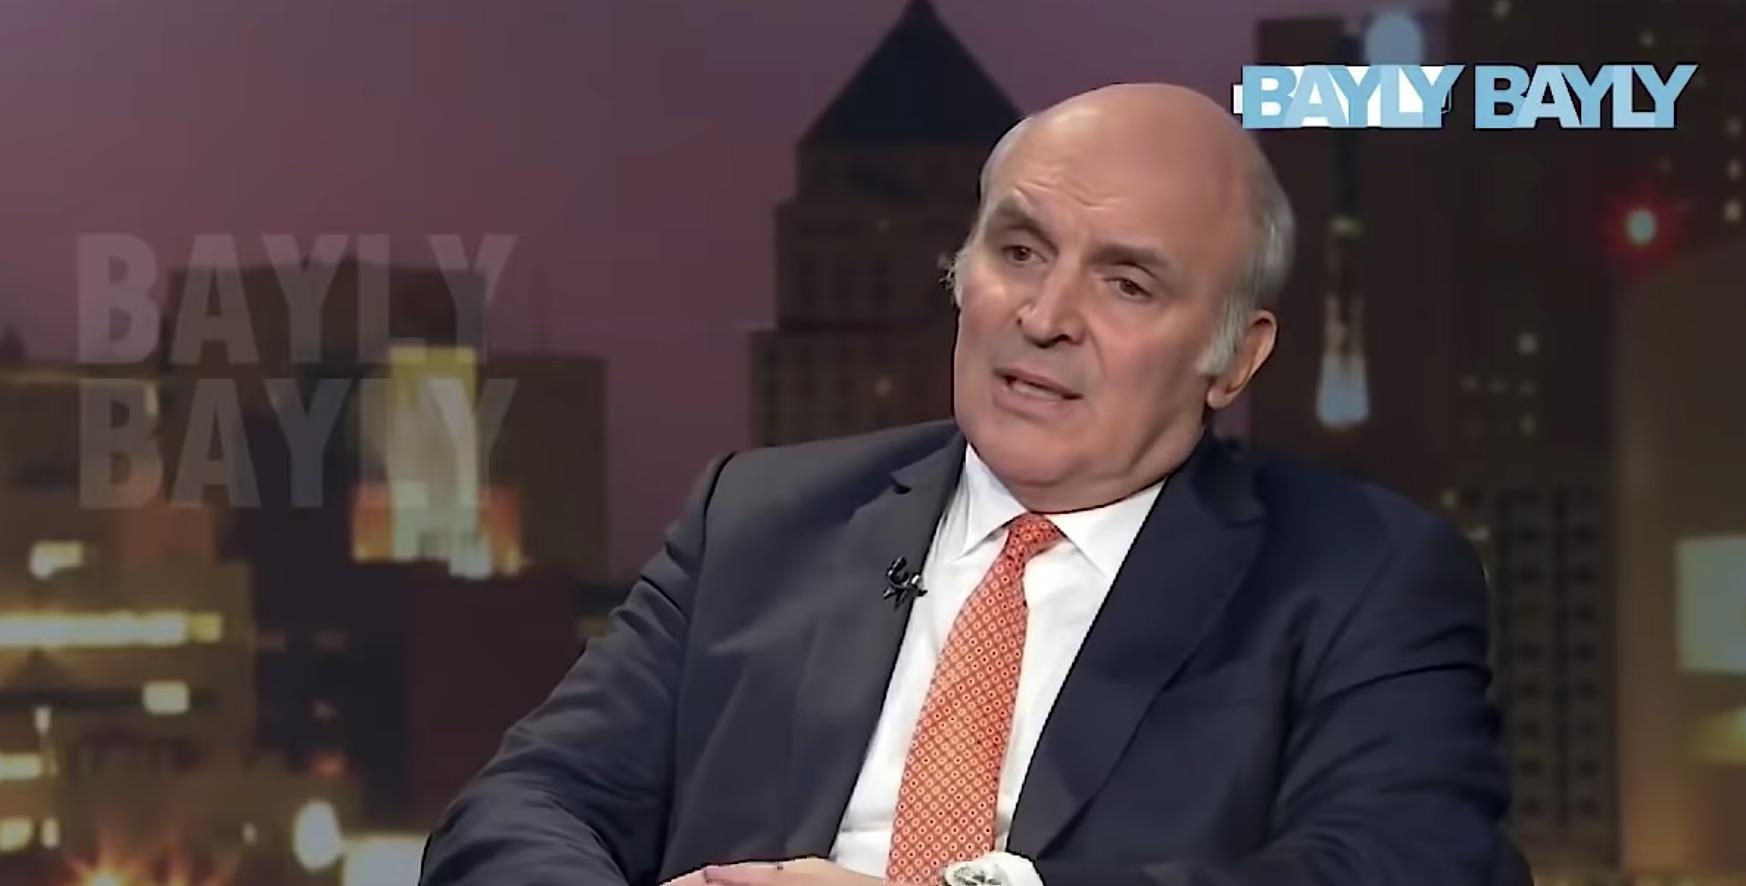 José Luis Espert, Jaime Bayly